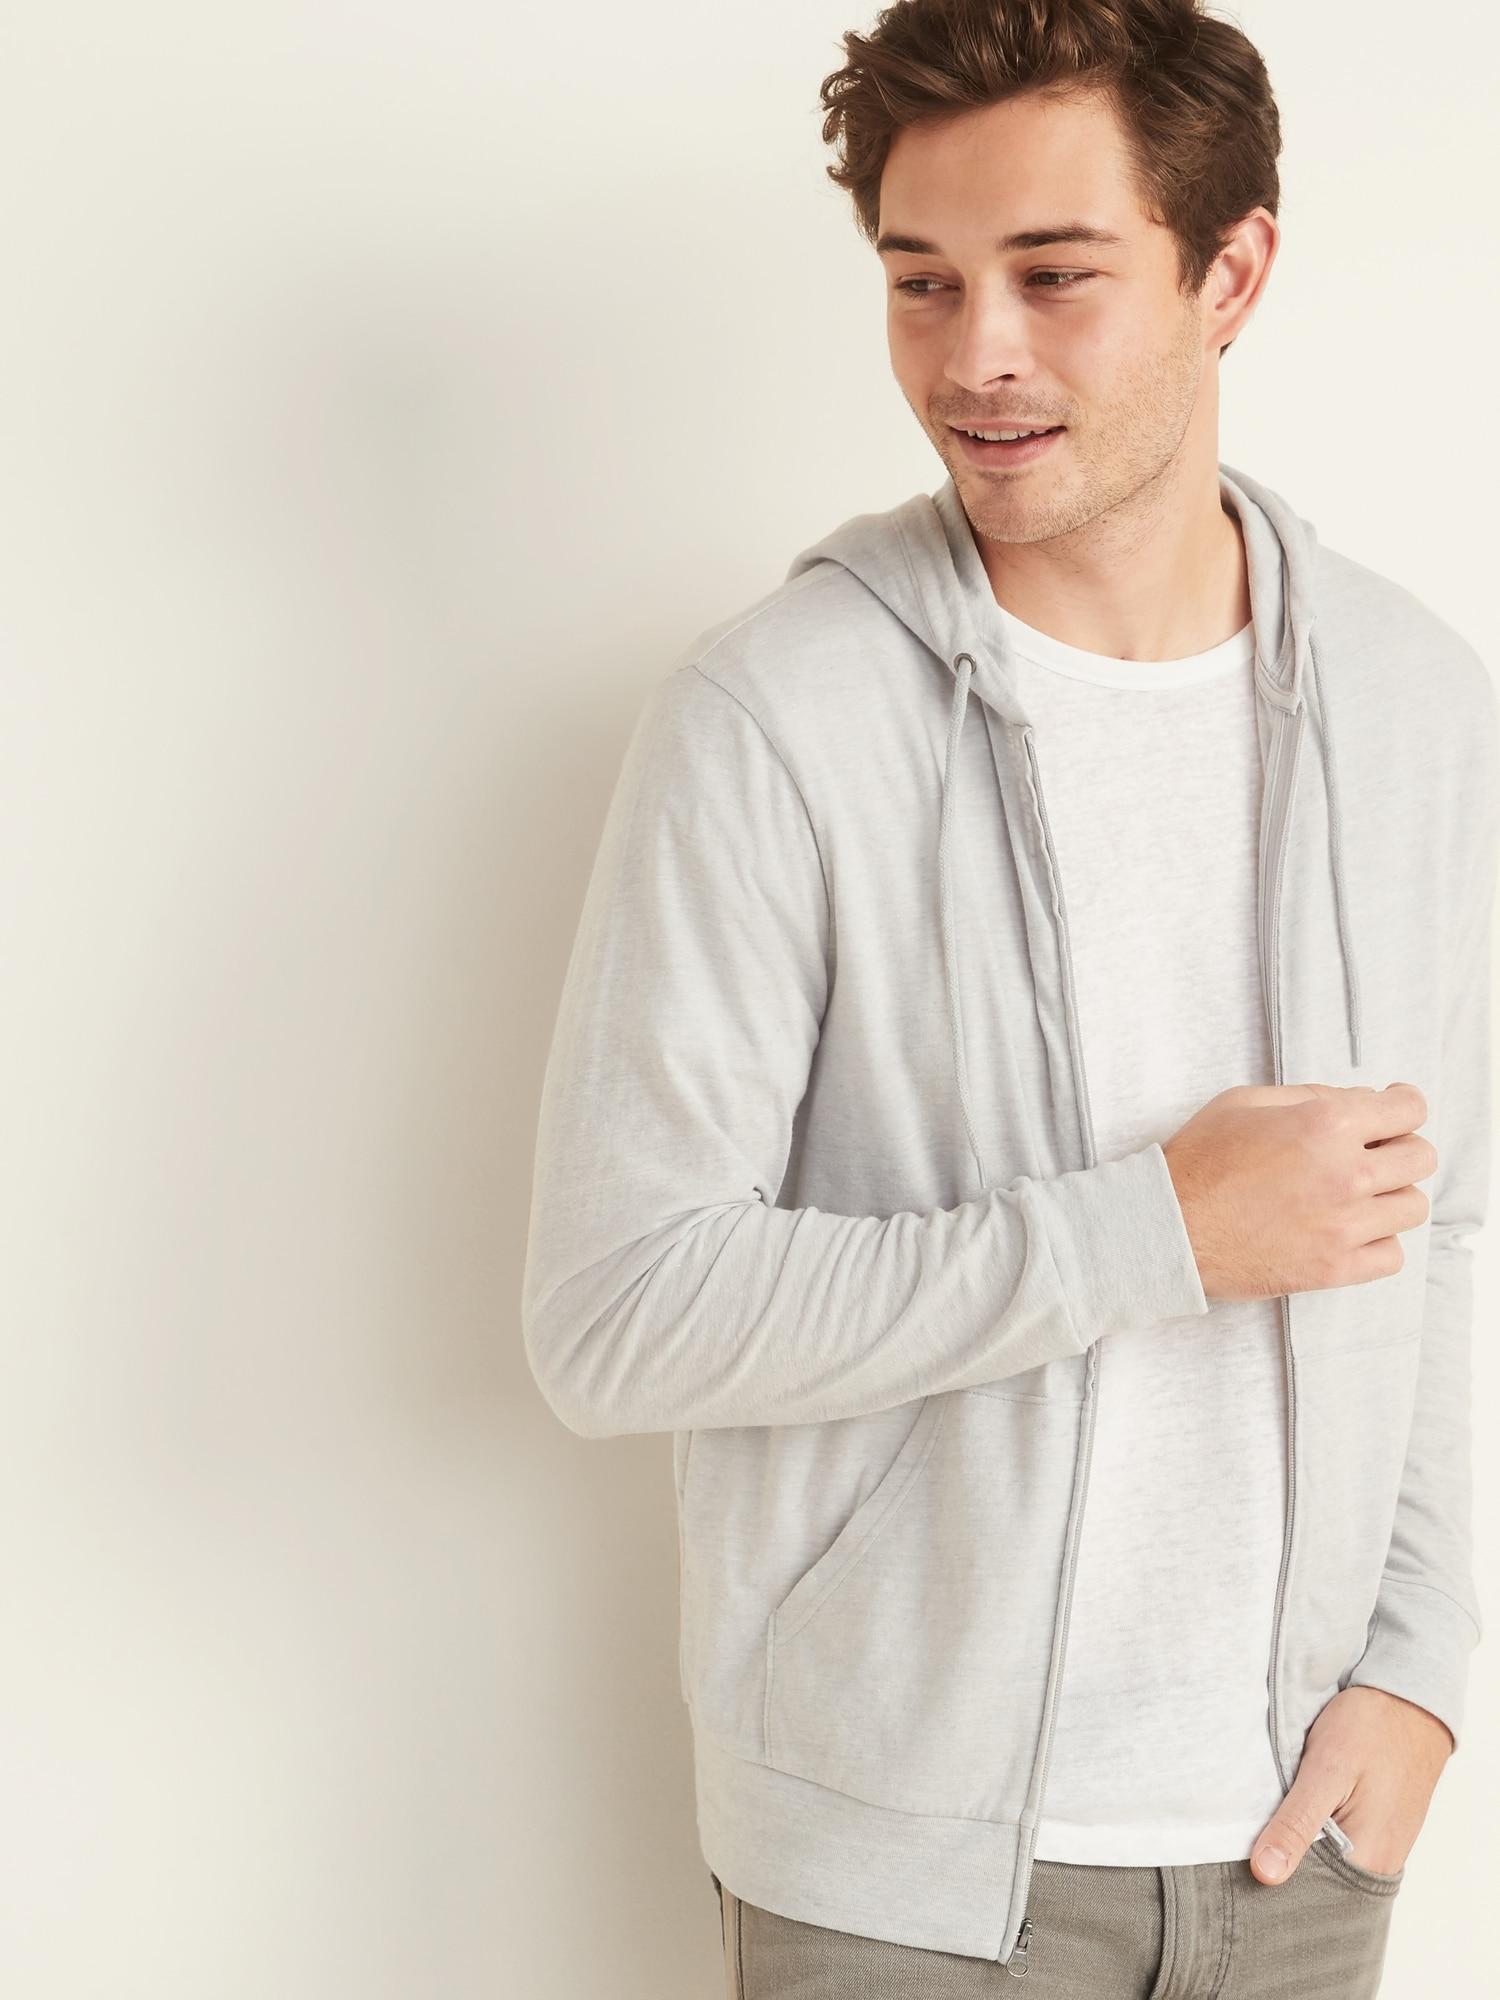 Soft-Washed Slub-Knit Zip Hoodie for Men